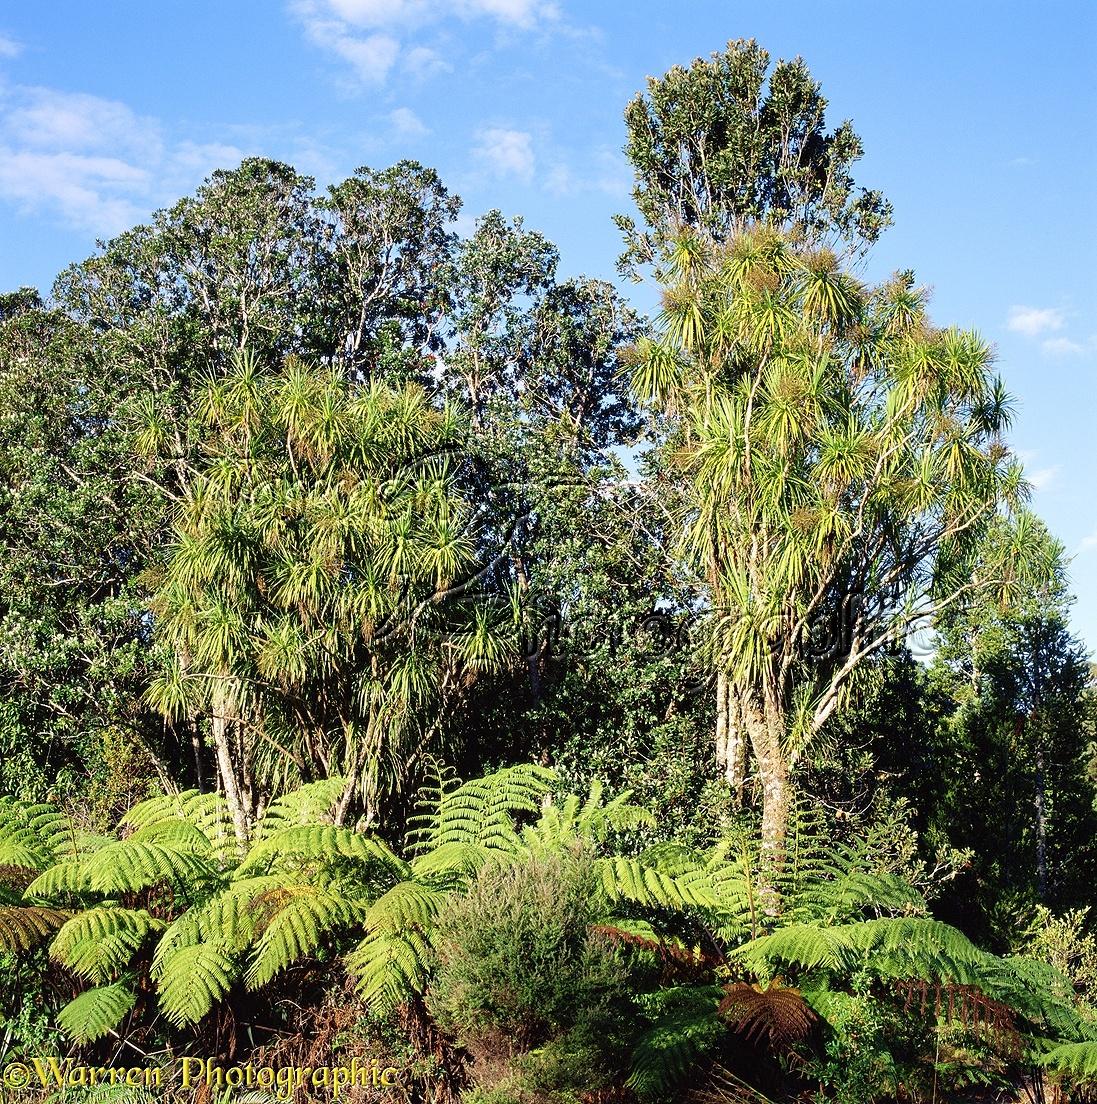 Wp03250 native plants of new zealand cabbage trees cordyline